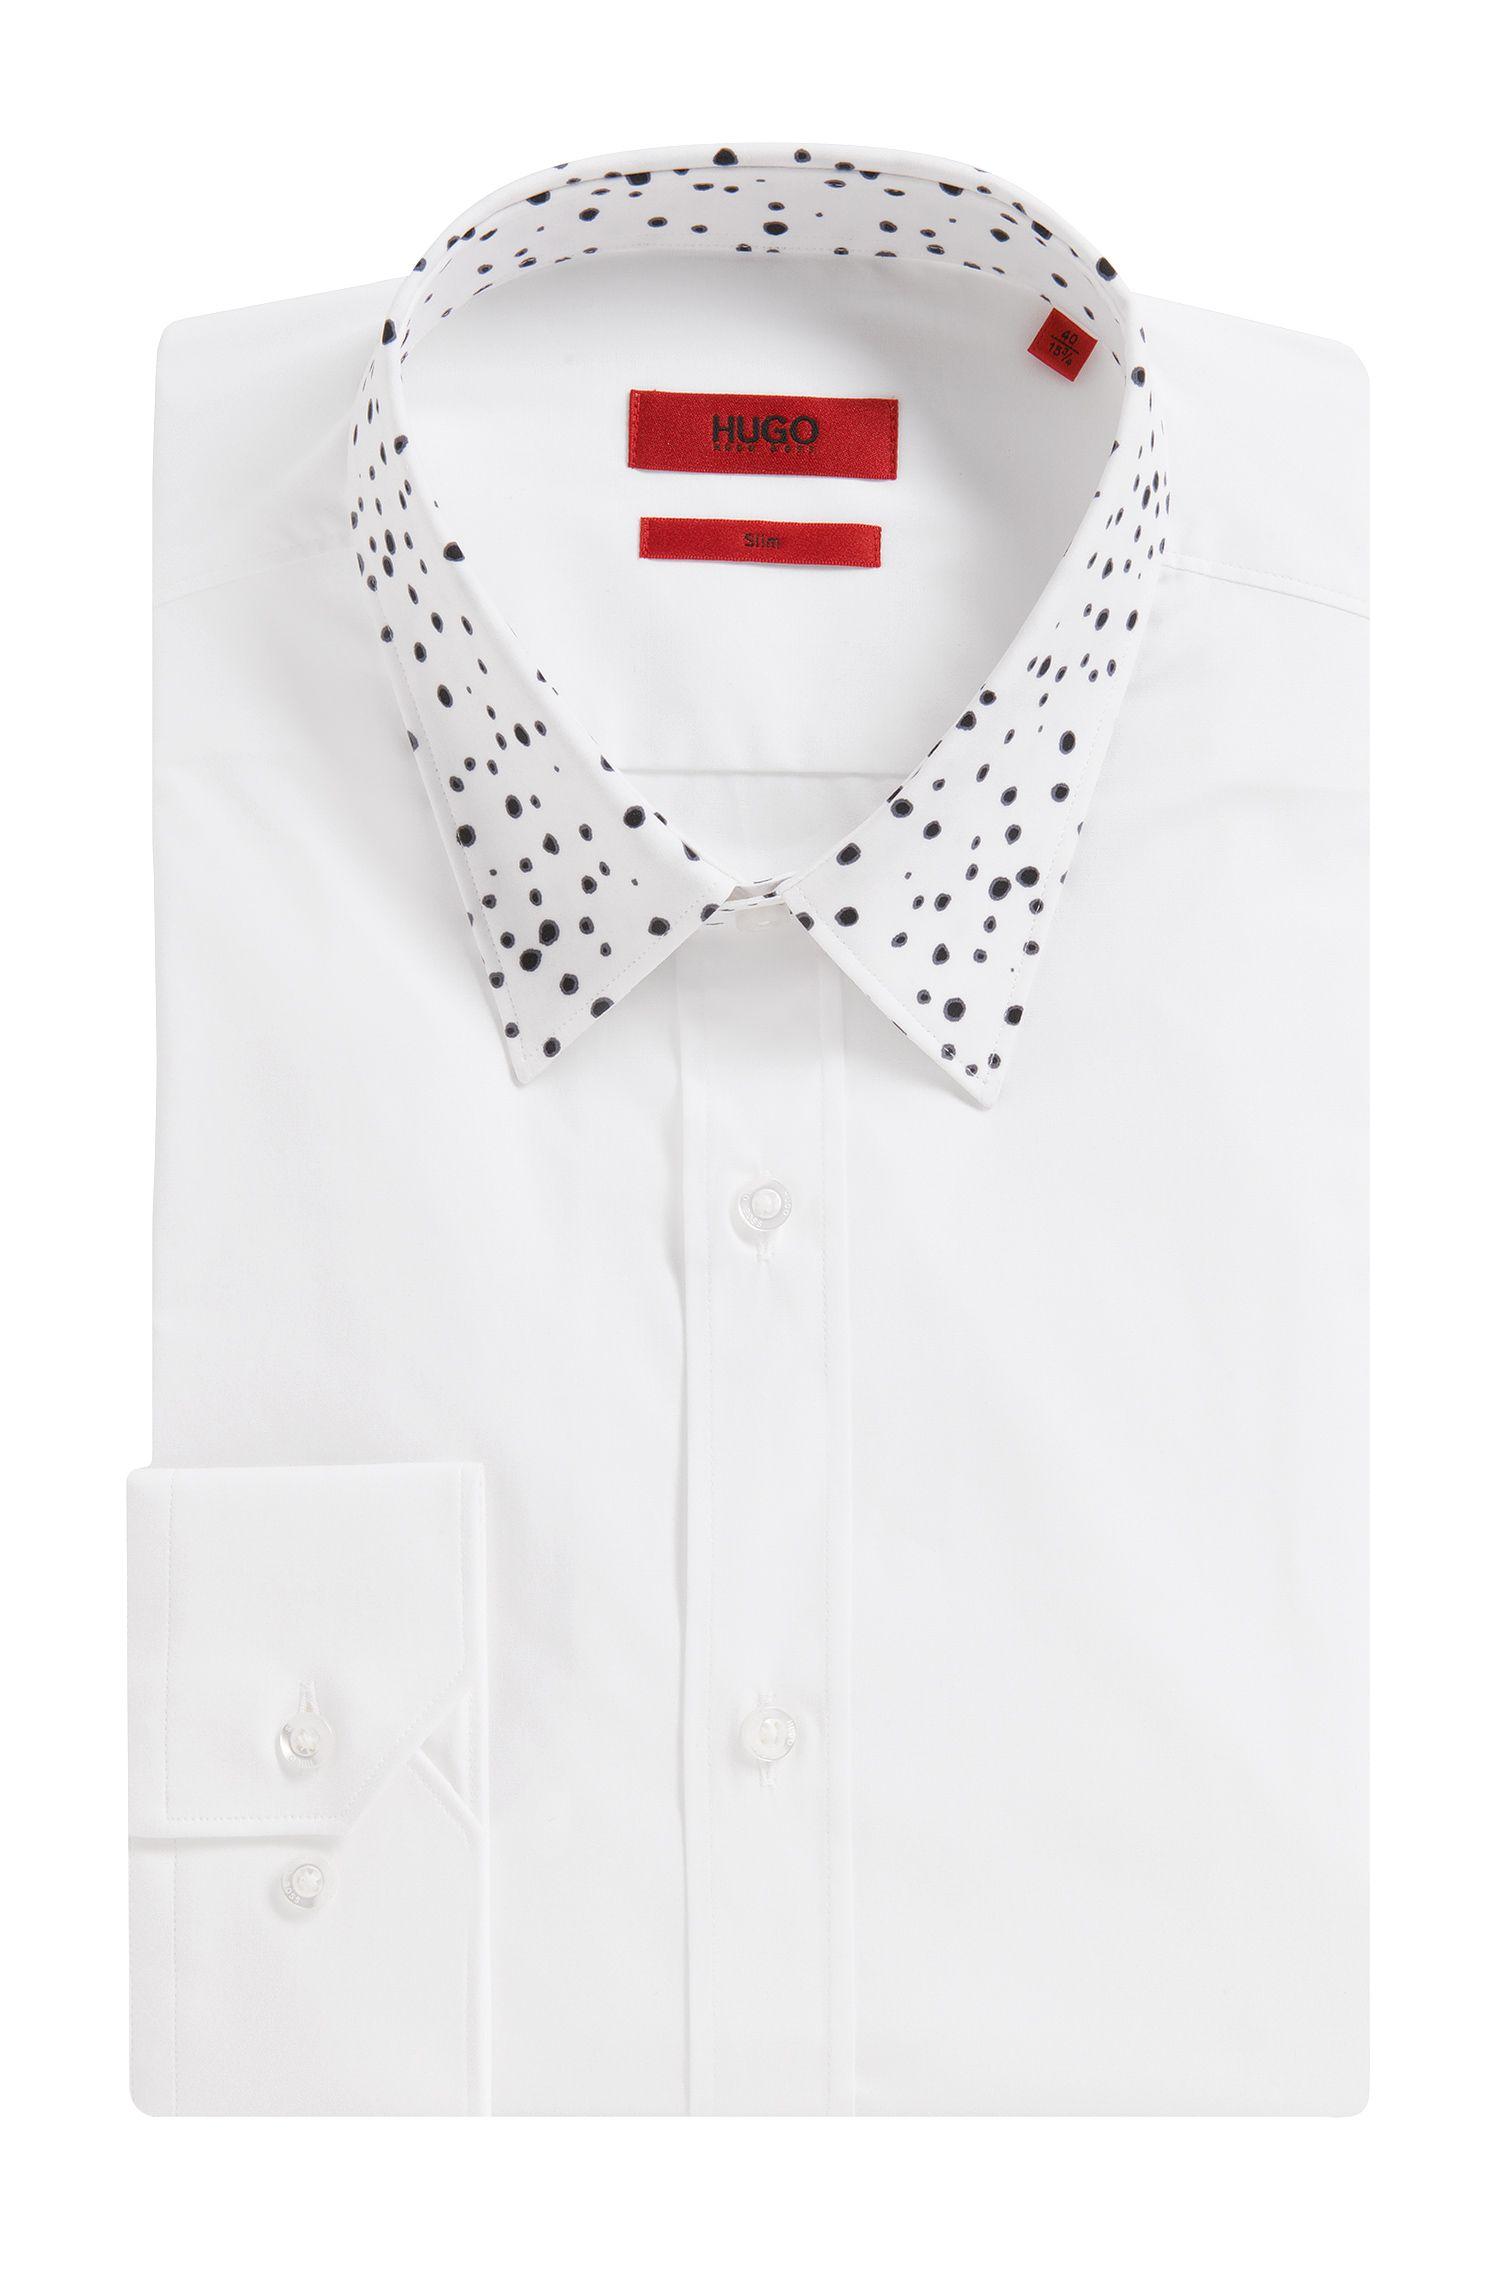 'Elisha' | Slim Fit, Stretch Cotton Button Down Shirt